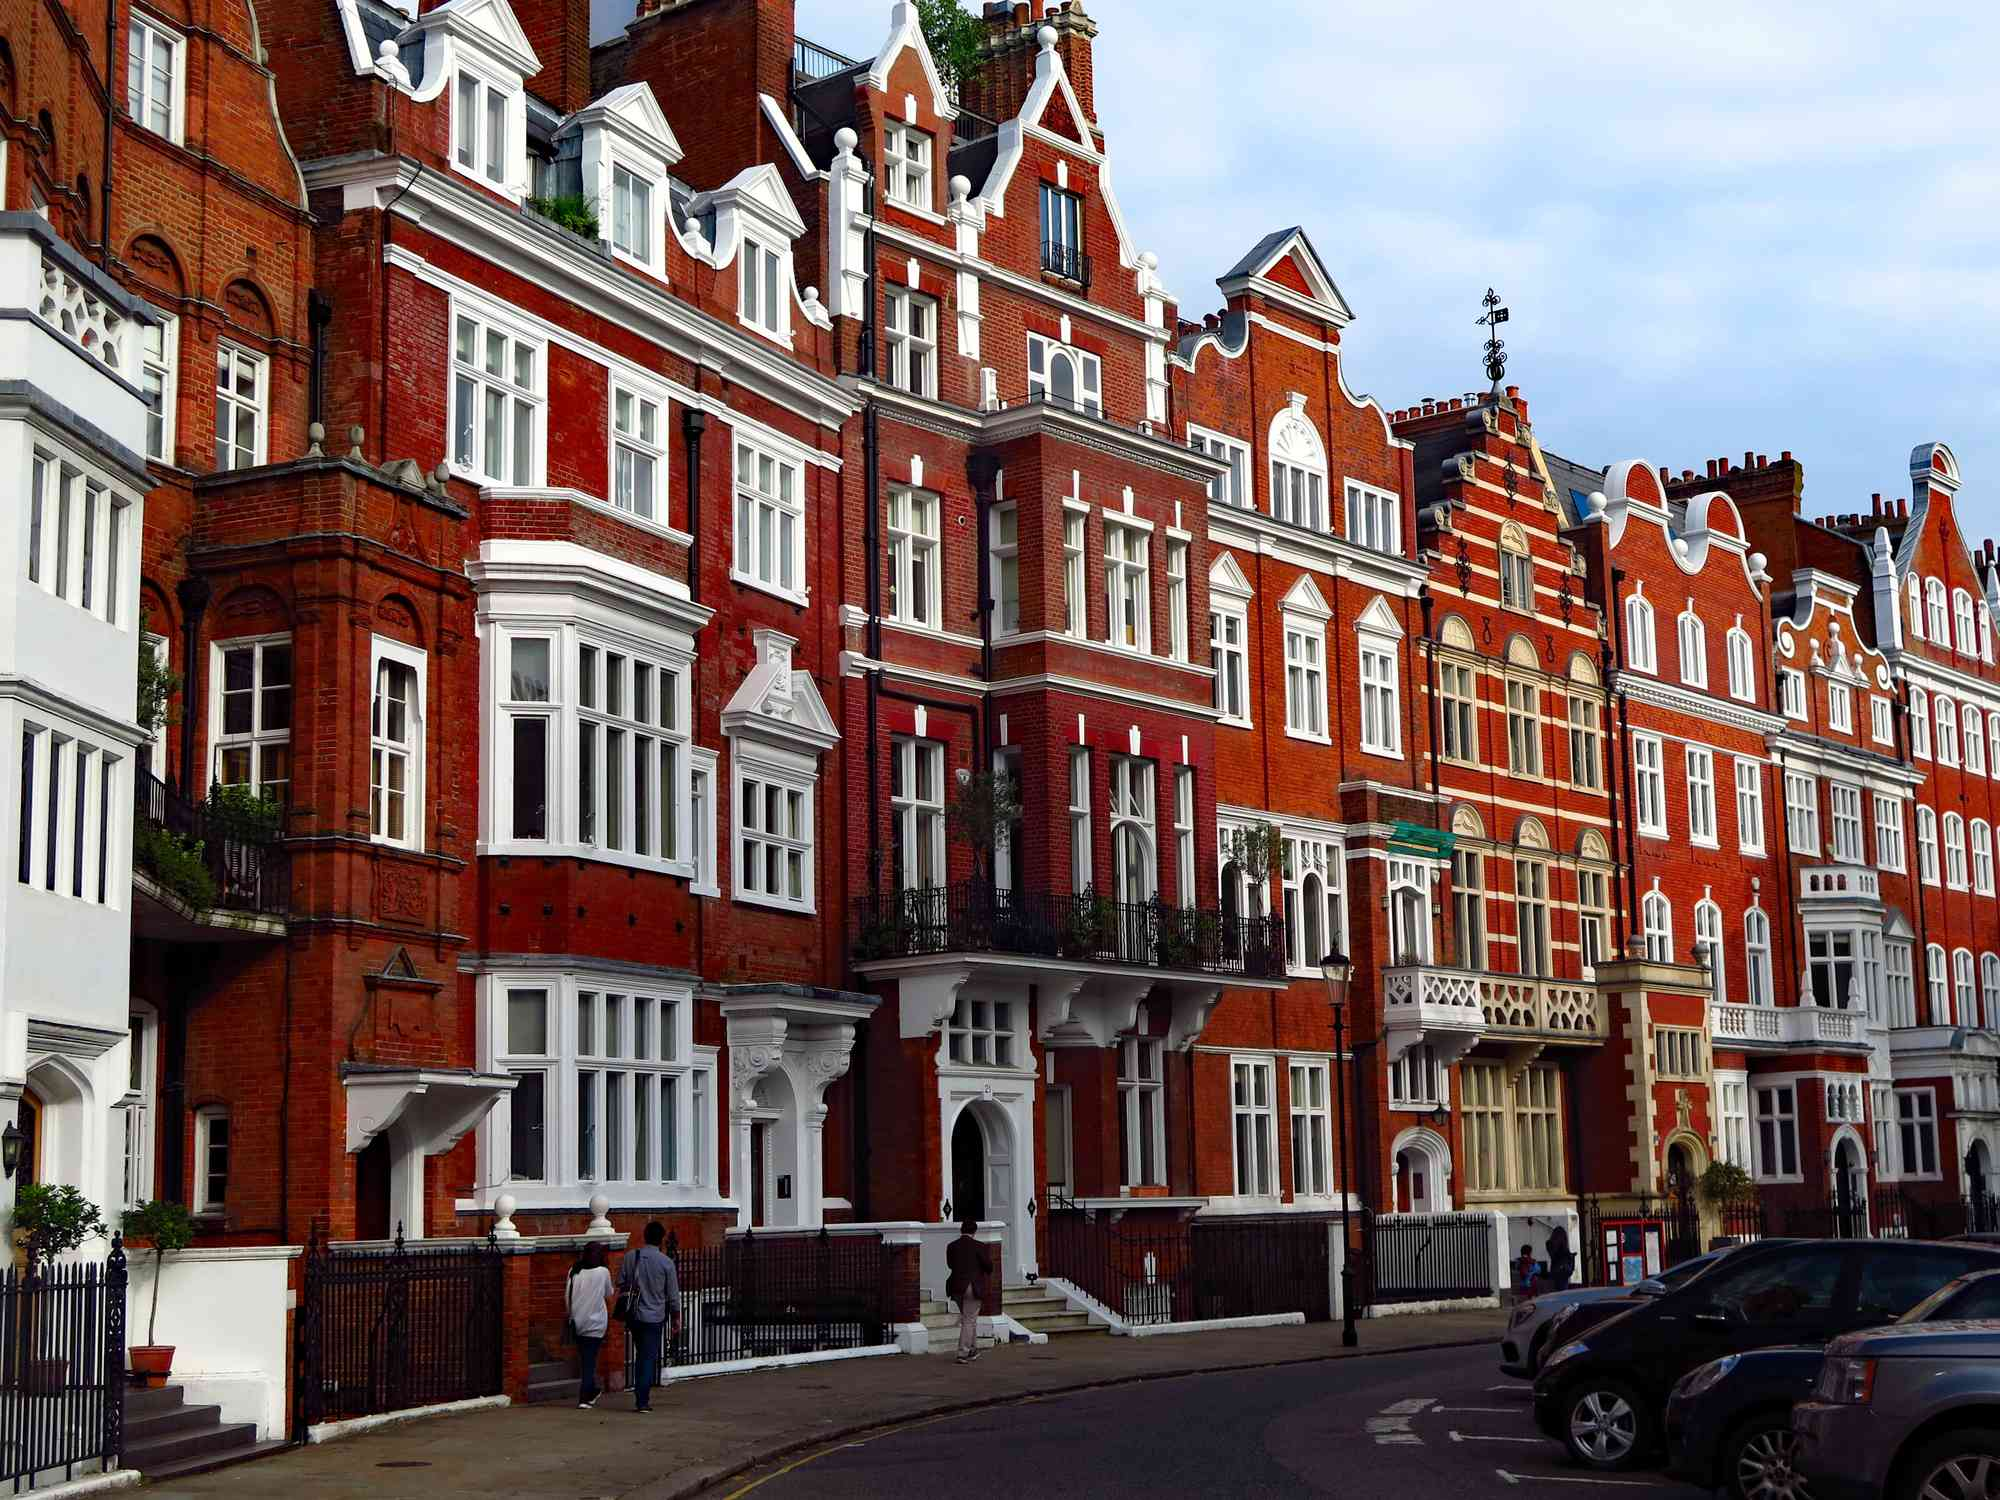 Victorians in Mayfair London.